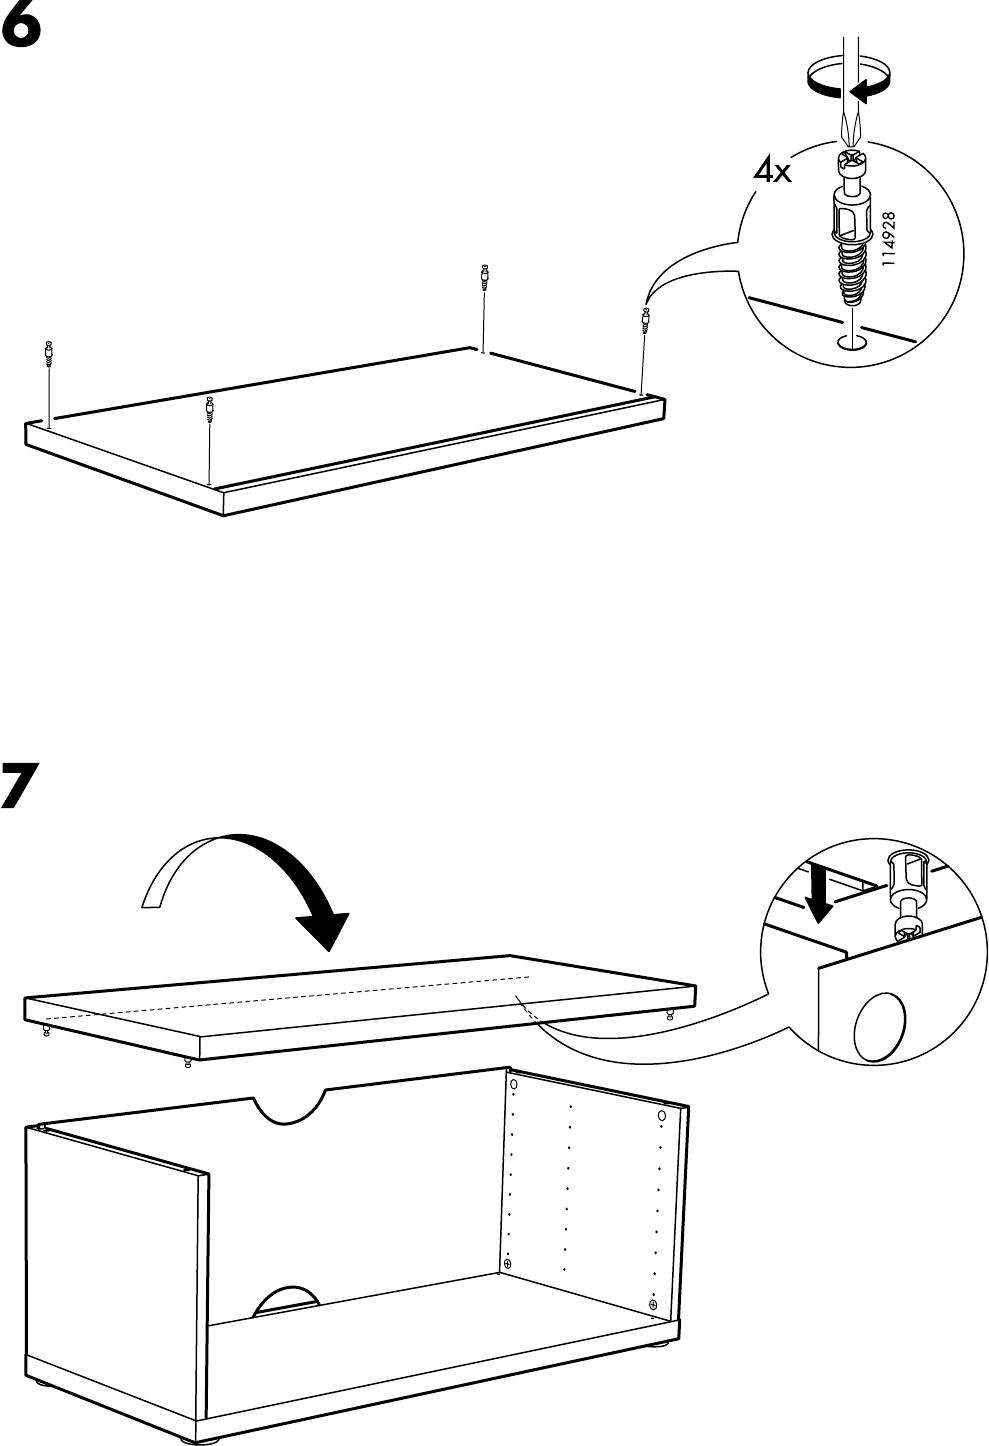 Ikea Mosjo Tv Meubel.Manual Ikea Mosjo Tv Meubel Page 4 Of 8 All Languages